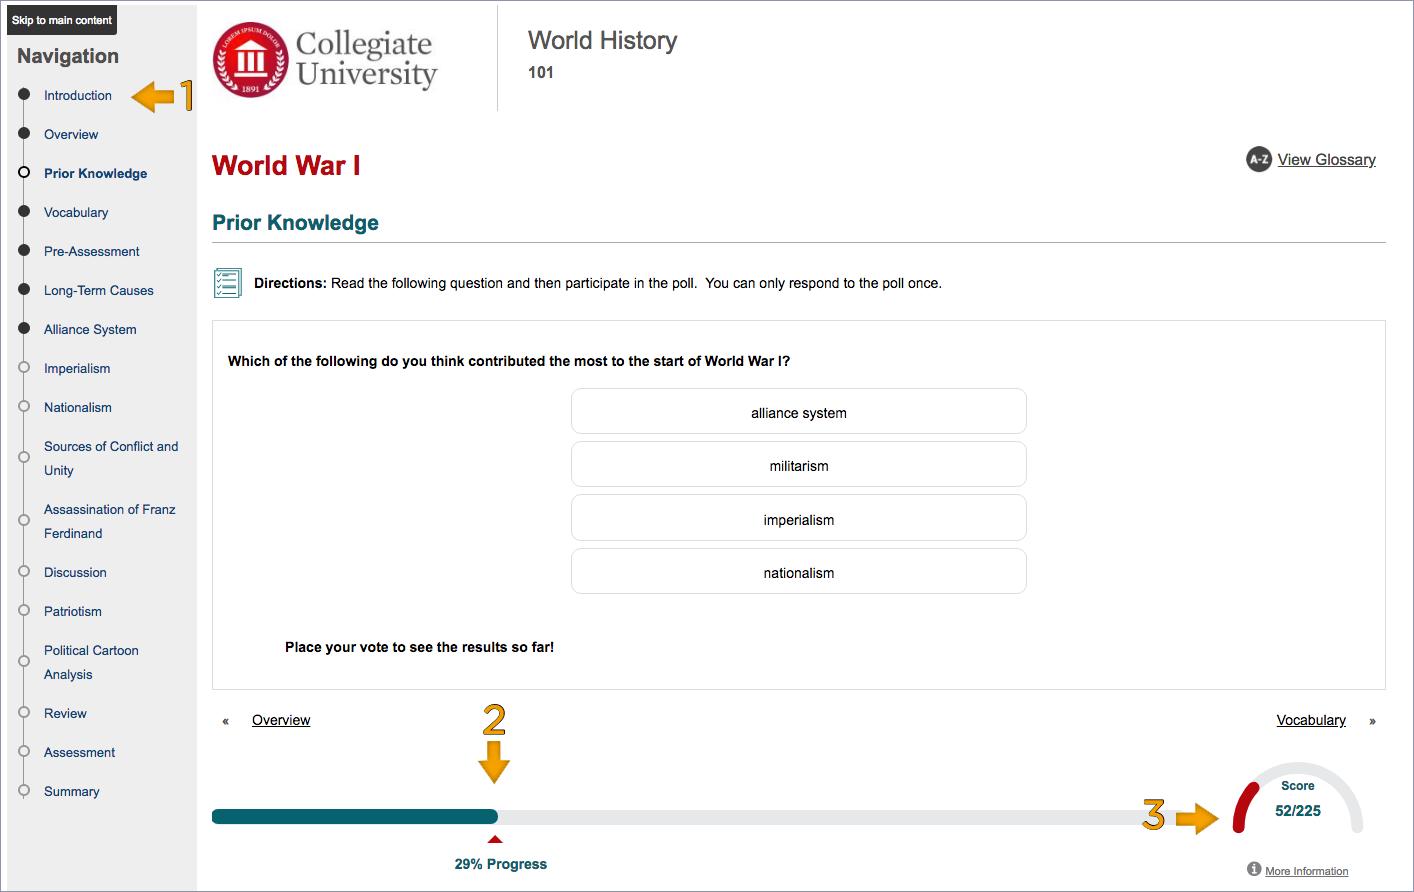 screenshot of student progress on a page